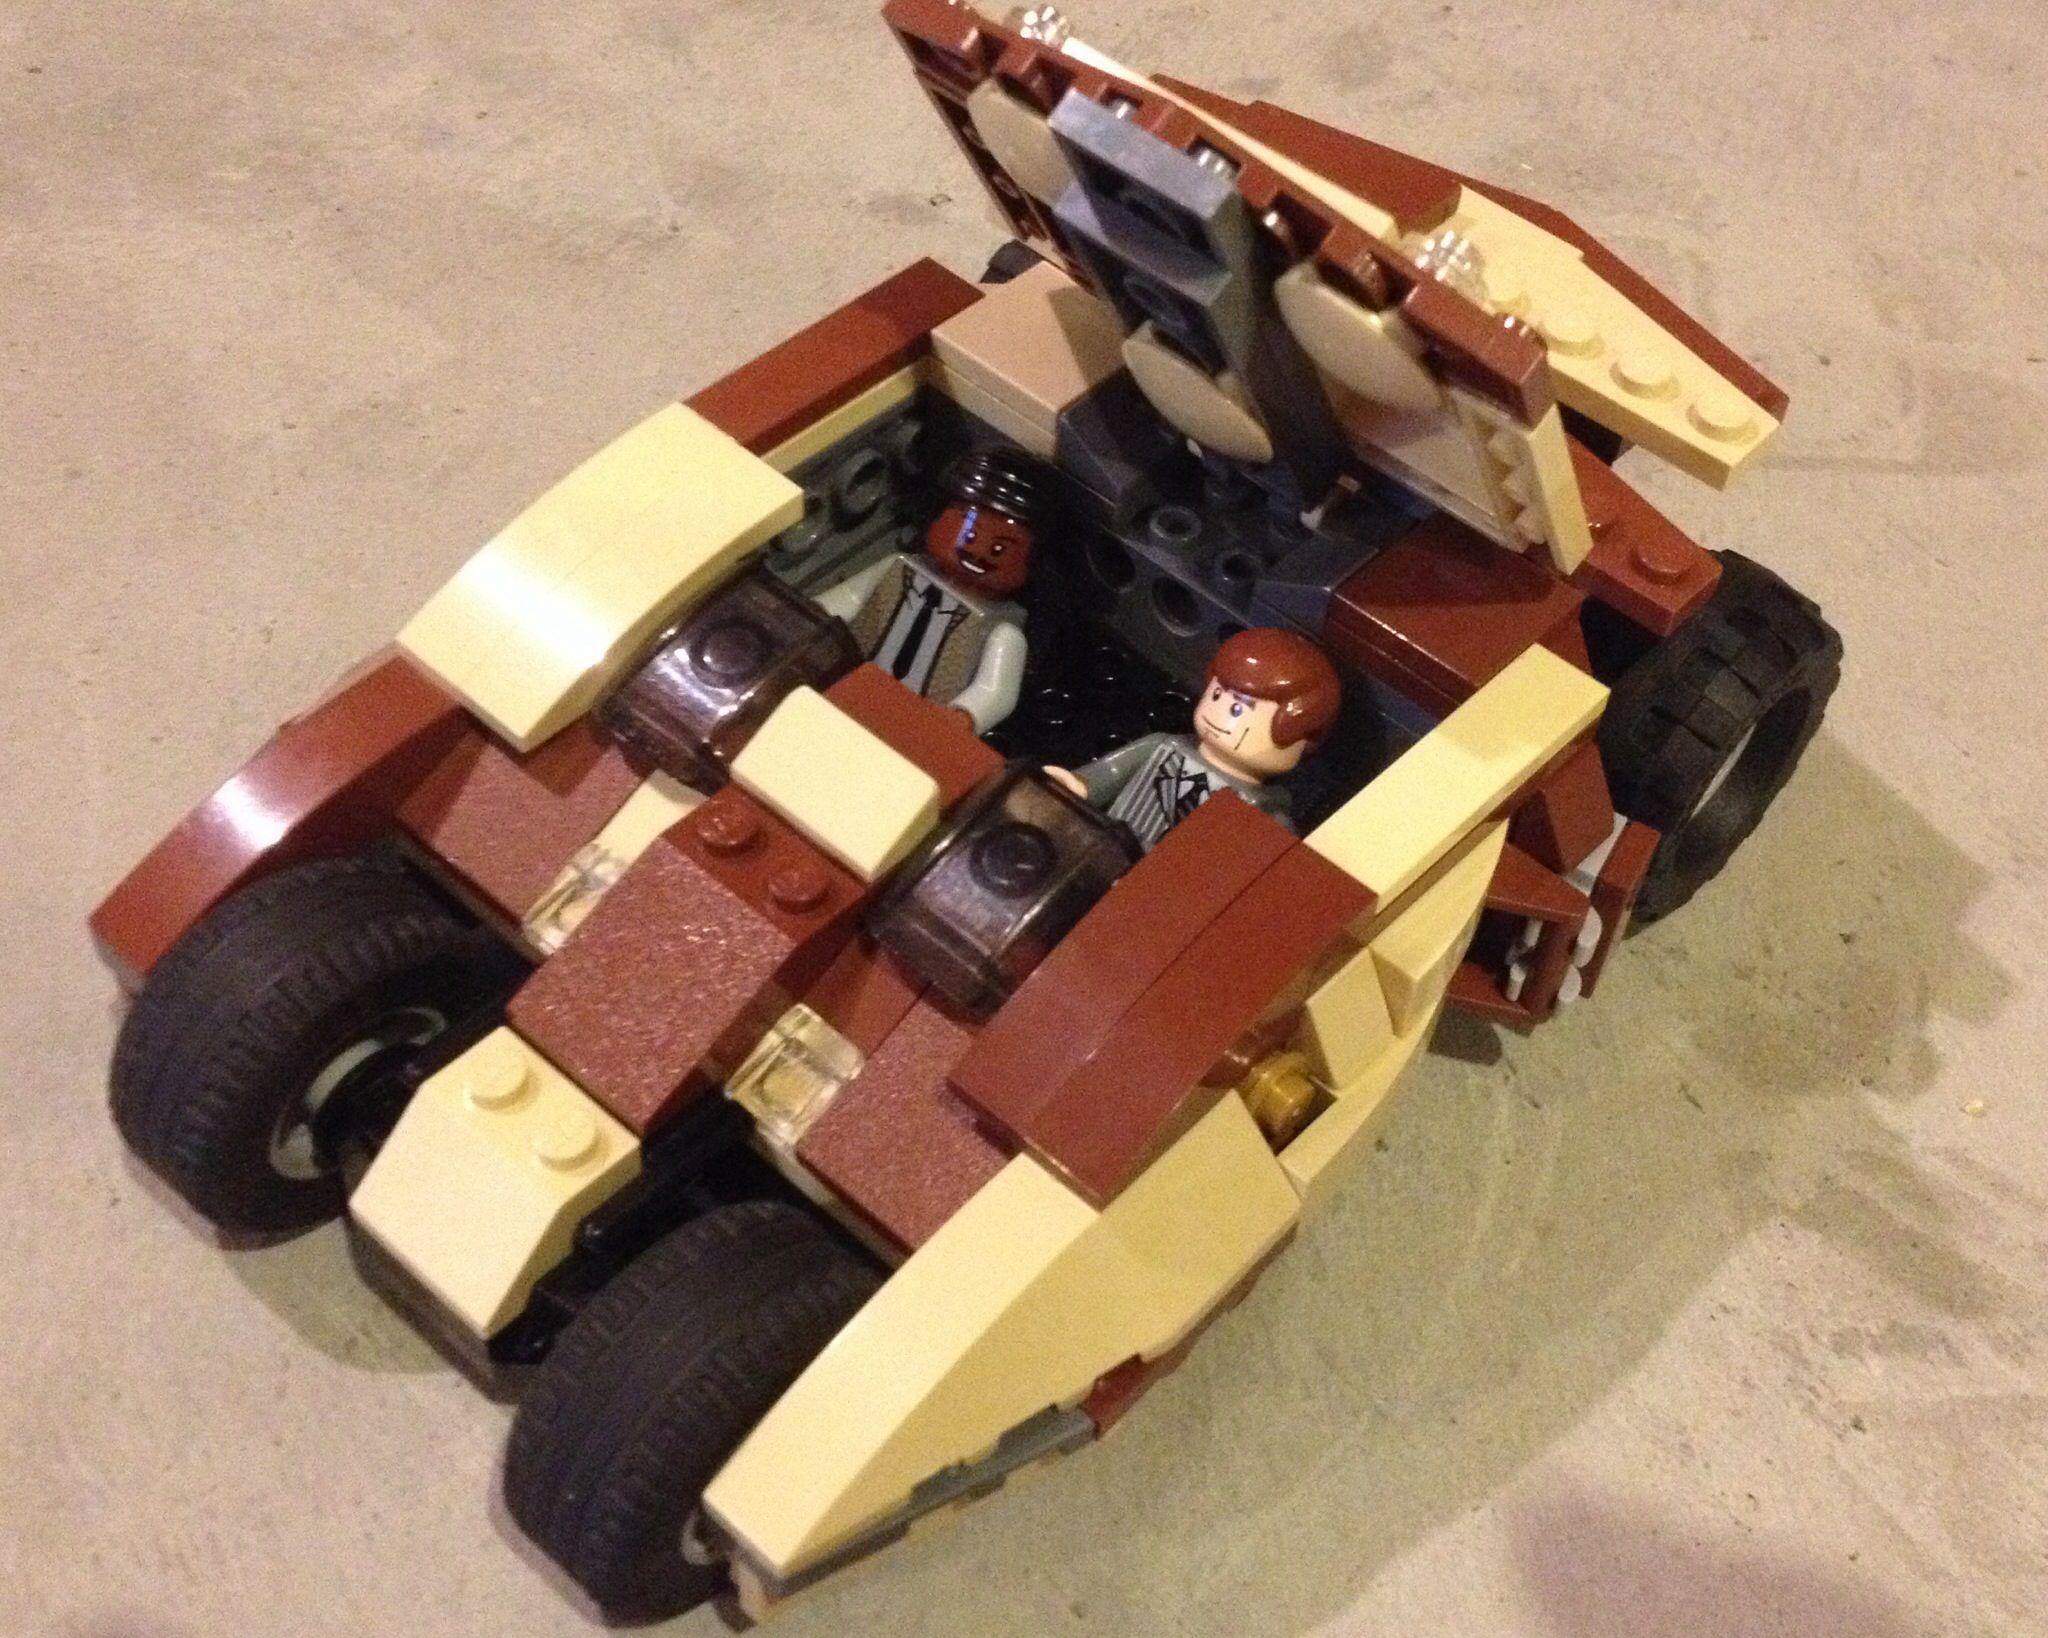 A custom Batman Tumbler The original version that Bruce Wayne